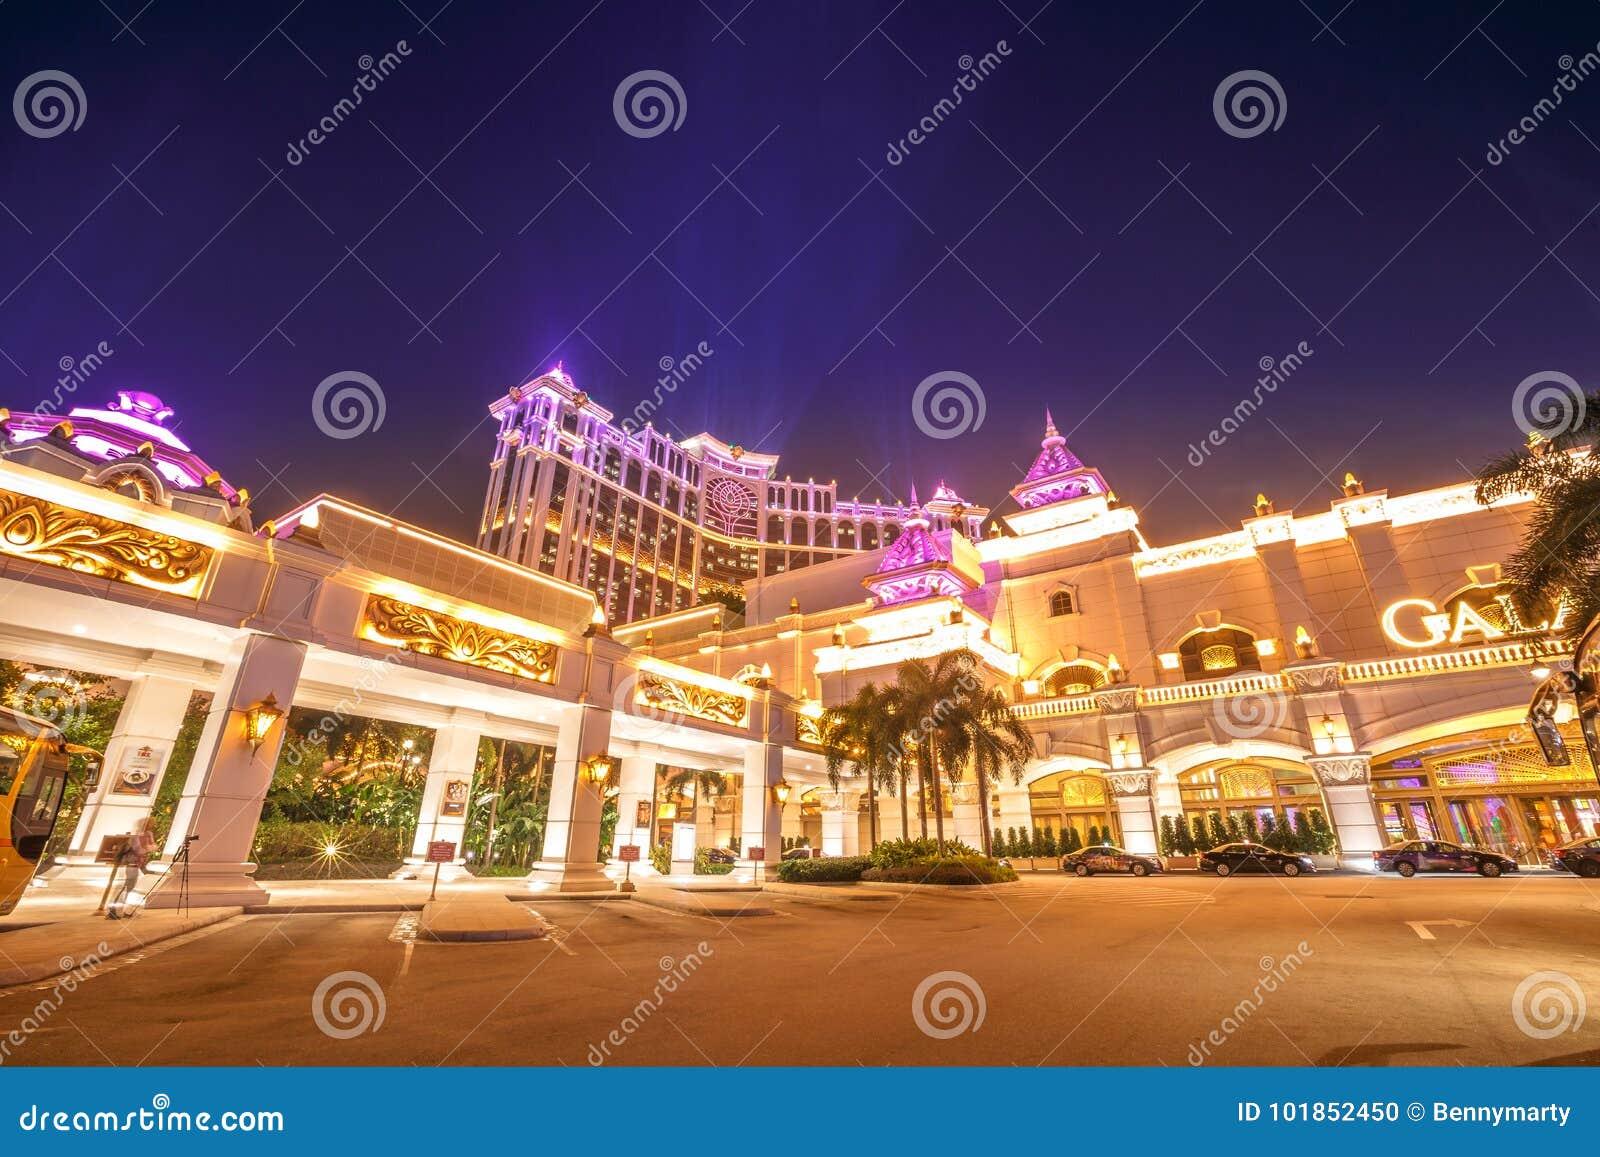 Golden Galaxy Casino